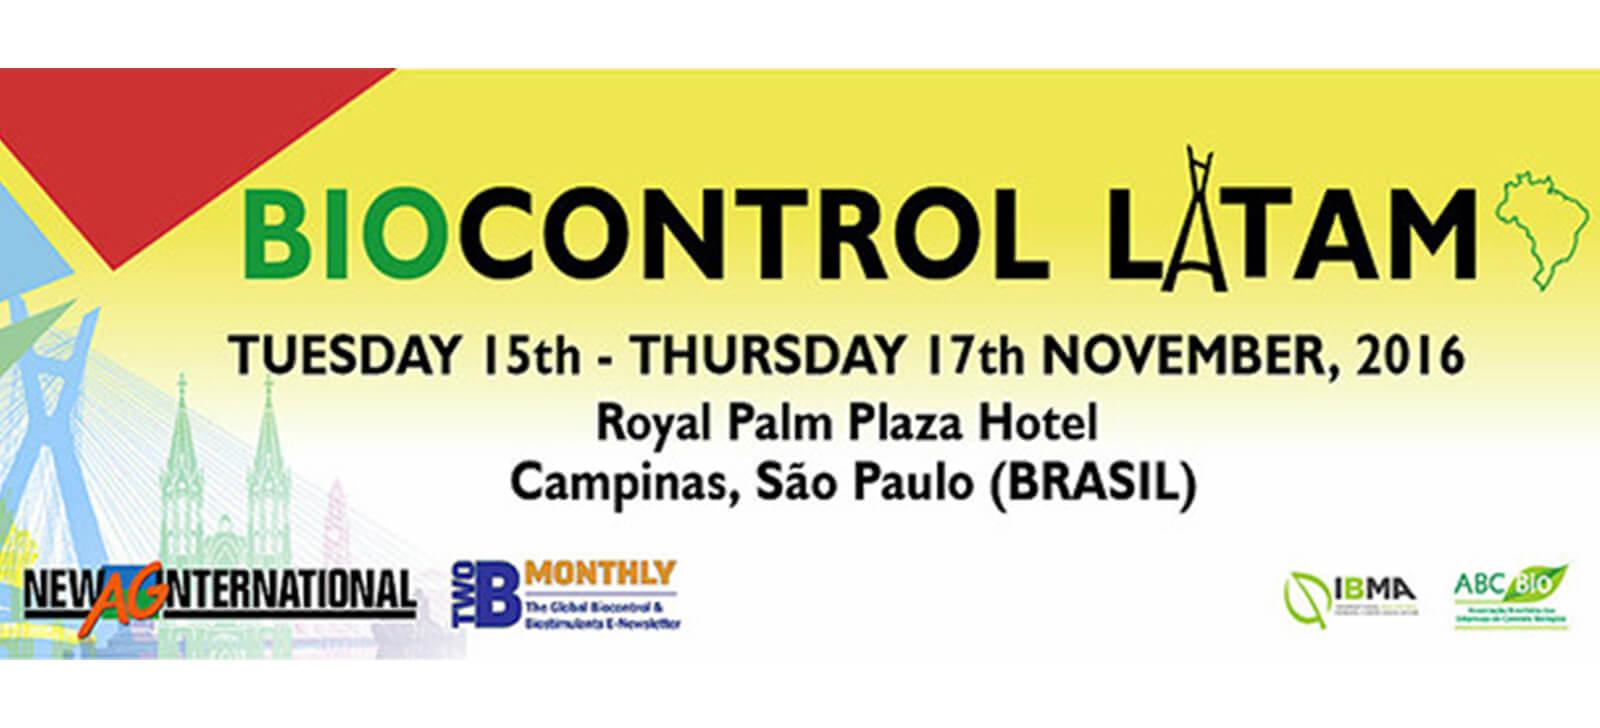 promip manejo integrado de pragas controle biologico biocontrol latam 2016 conference